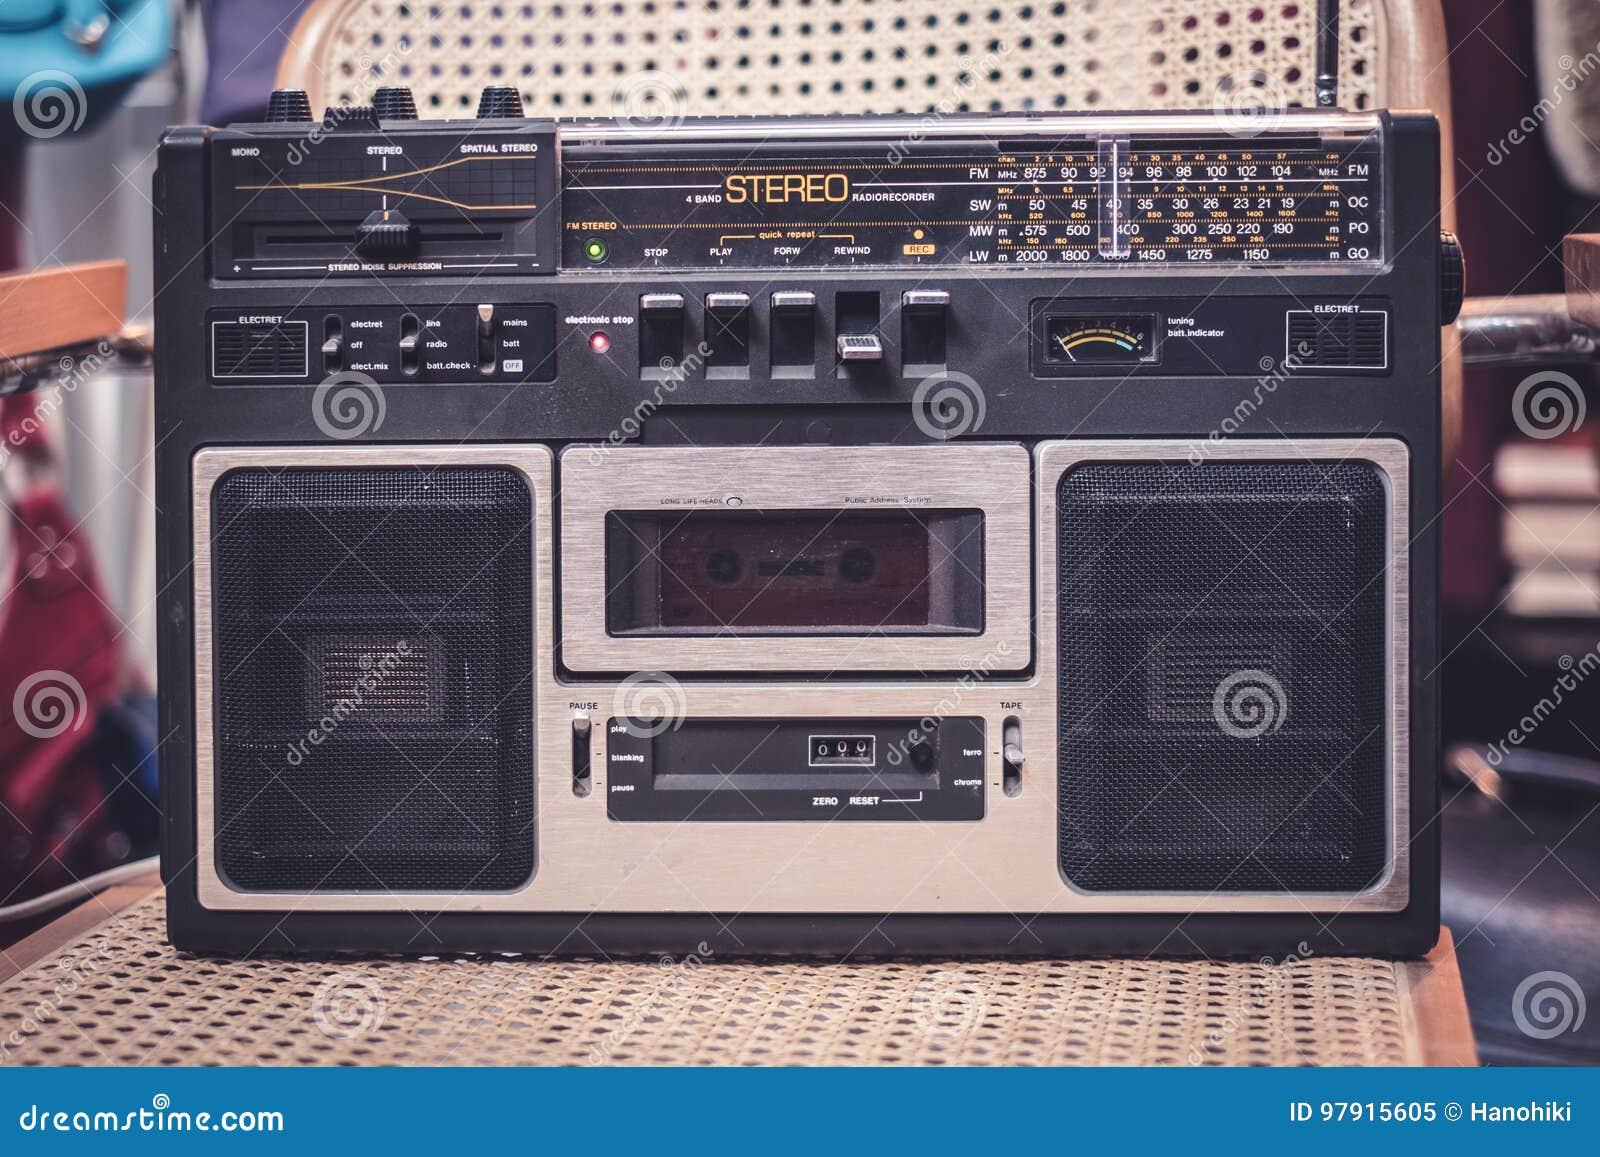 Cassette recorder / audio player - 80s radio